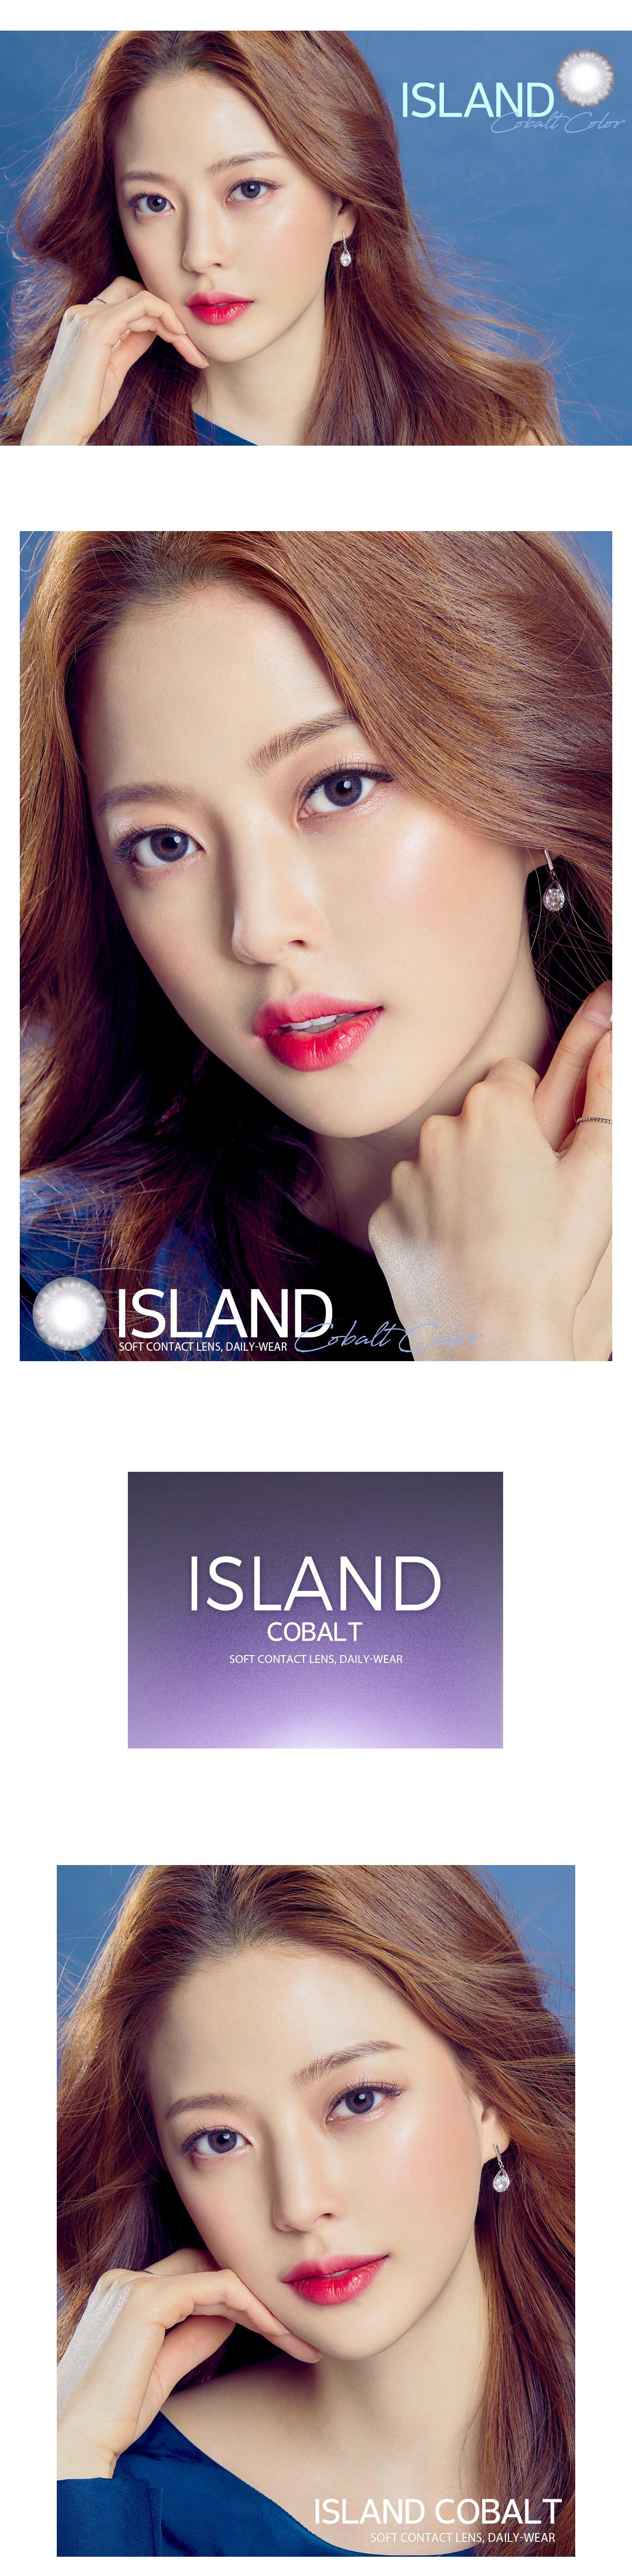 islandcobalt2.jpg